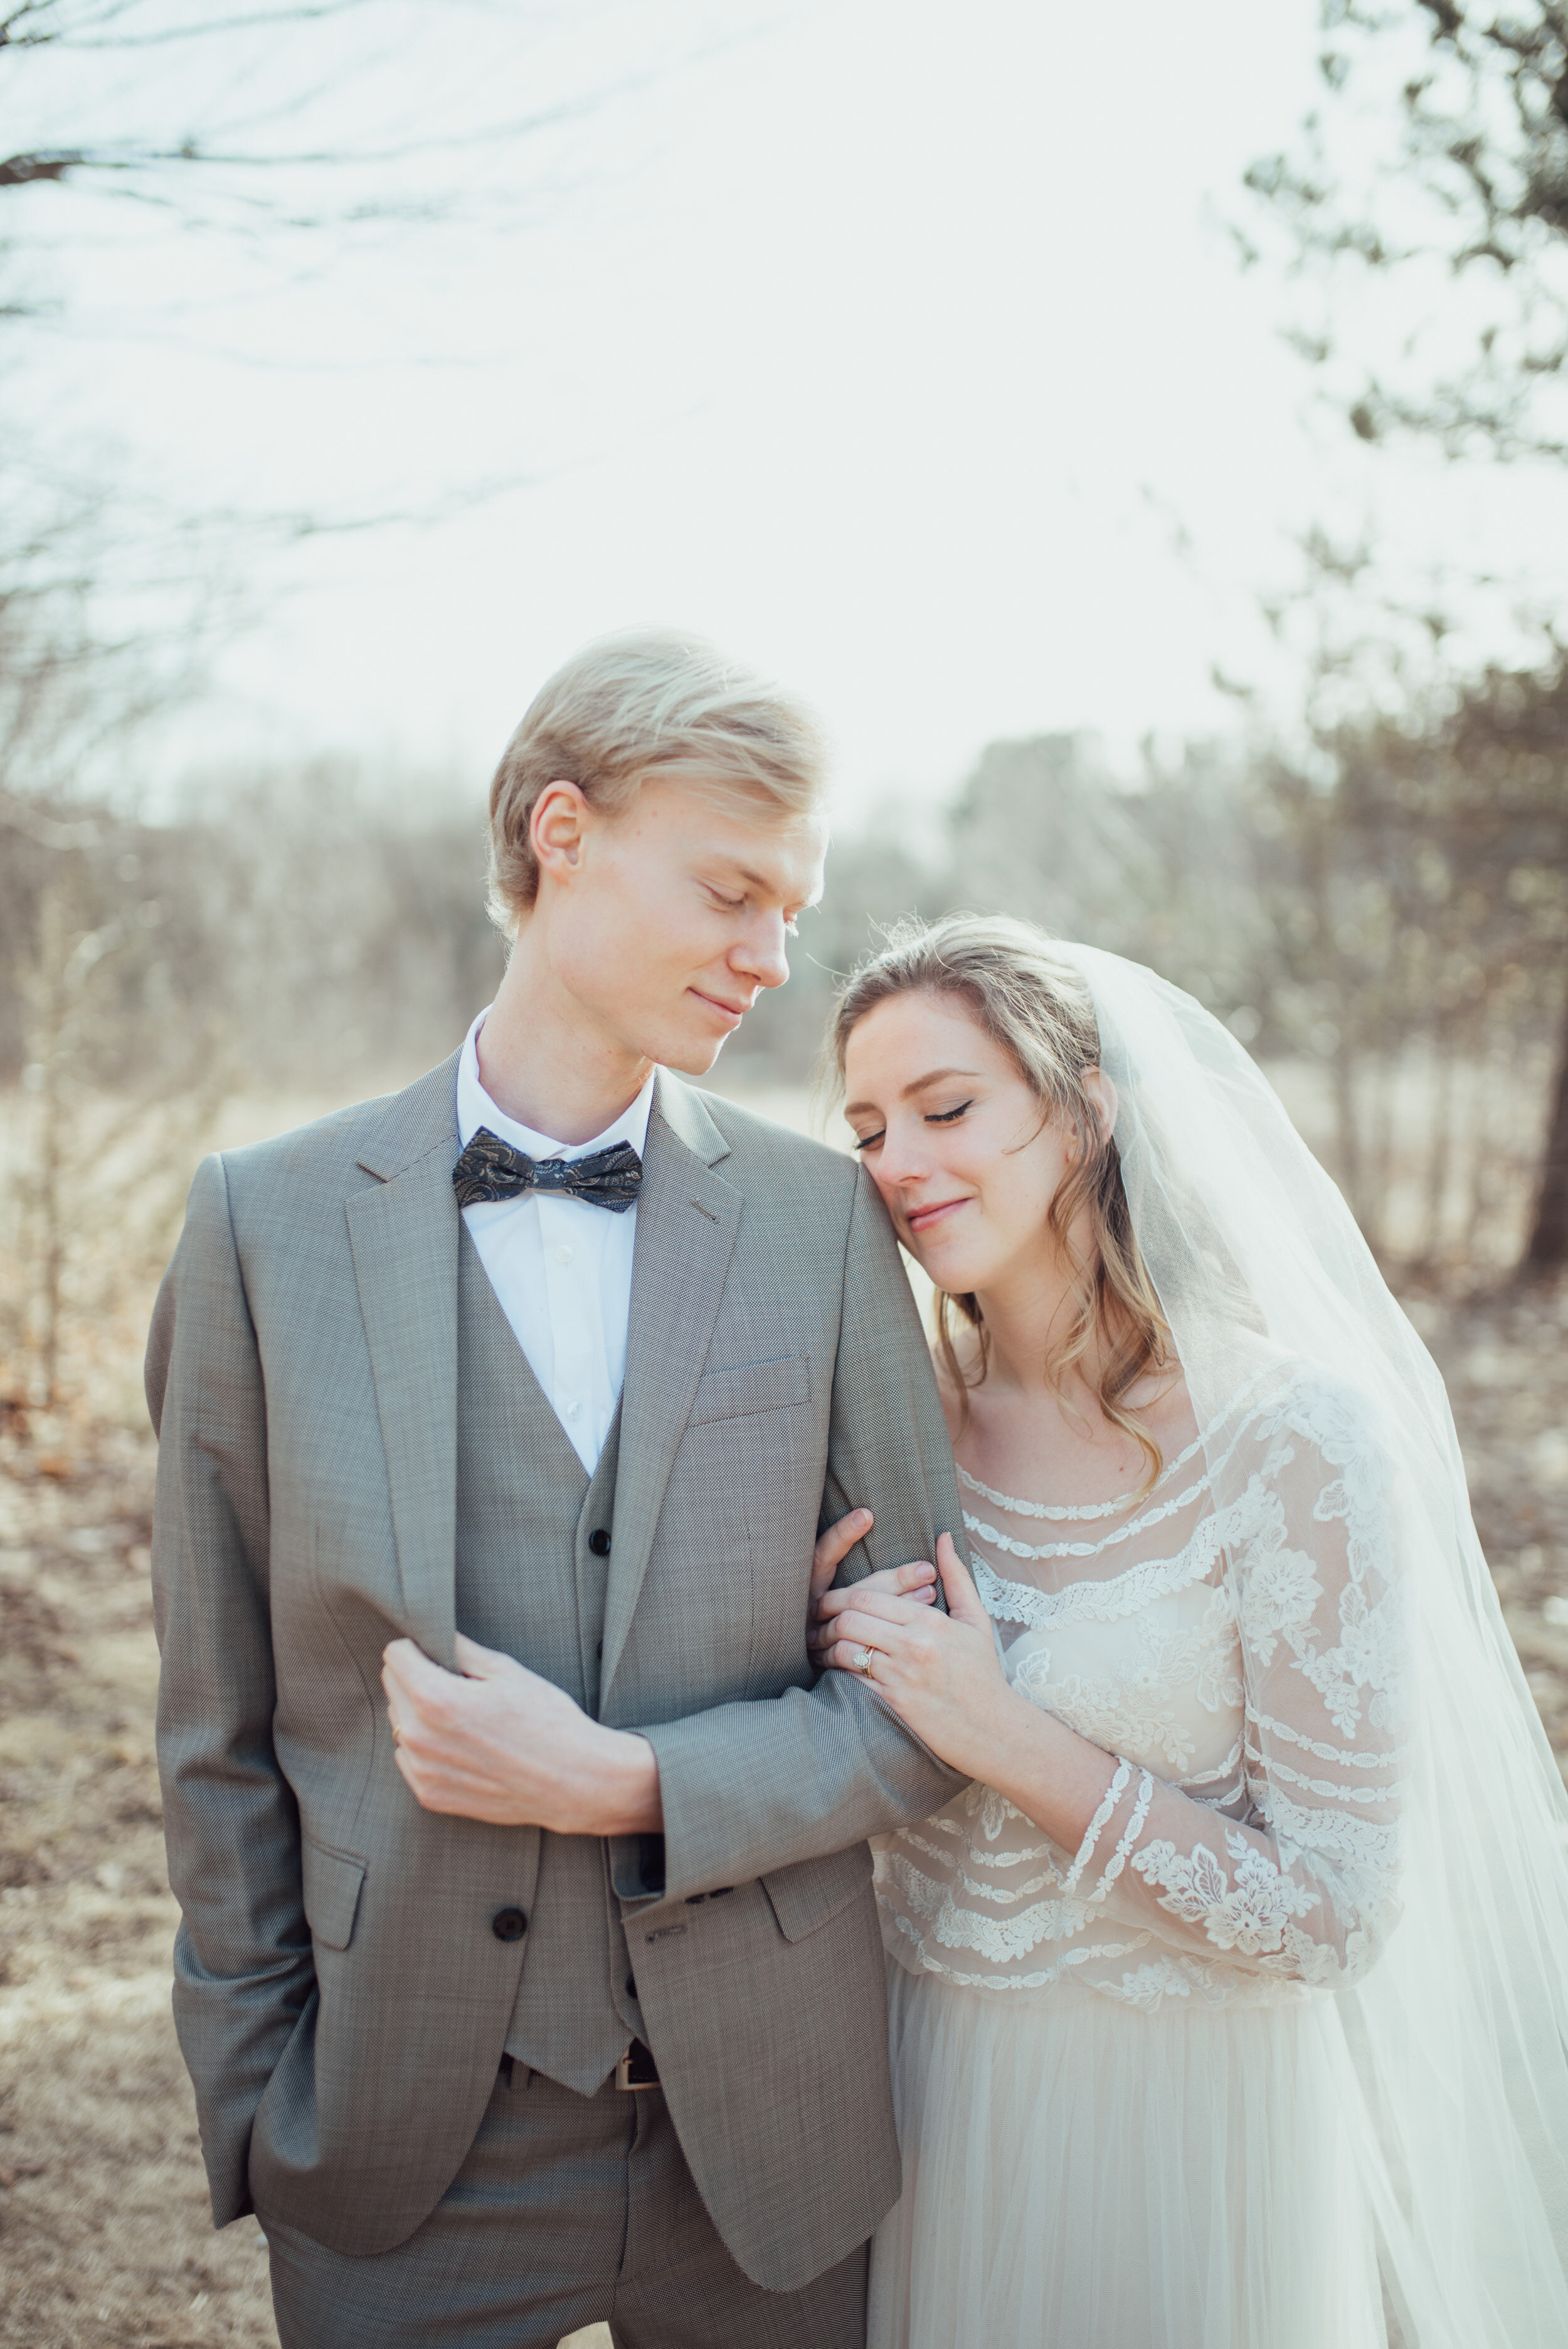 cleland-fine-art-wedding-photography-6.jpg